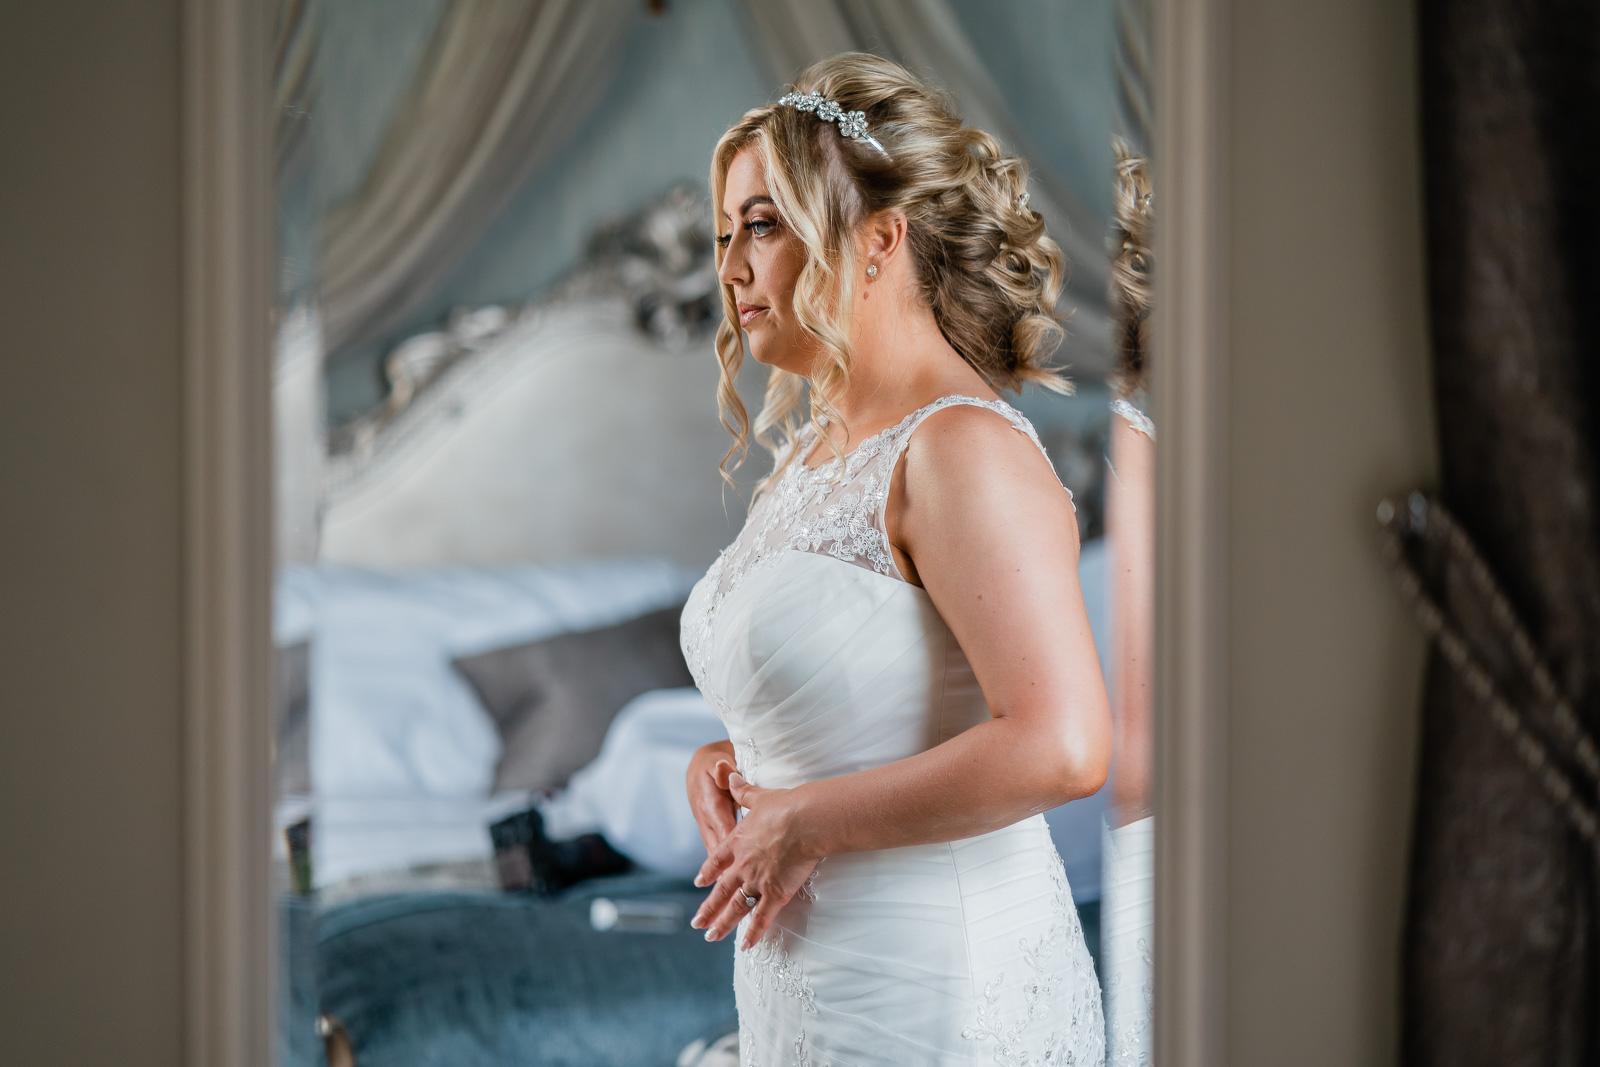 cornhill_castle_wedding_biggar_dearlyphotography (44 of 448).jpg